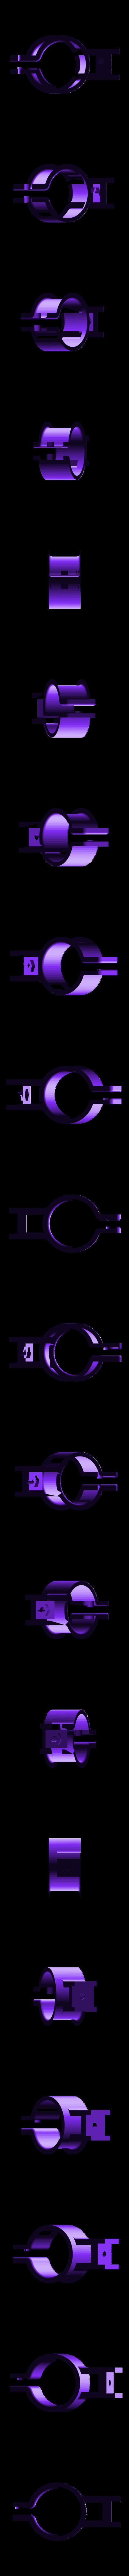 bhl-plate-clip.stl Download free STL file NeoPixel Bike Light • 3D printer template, Adafruit